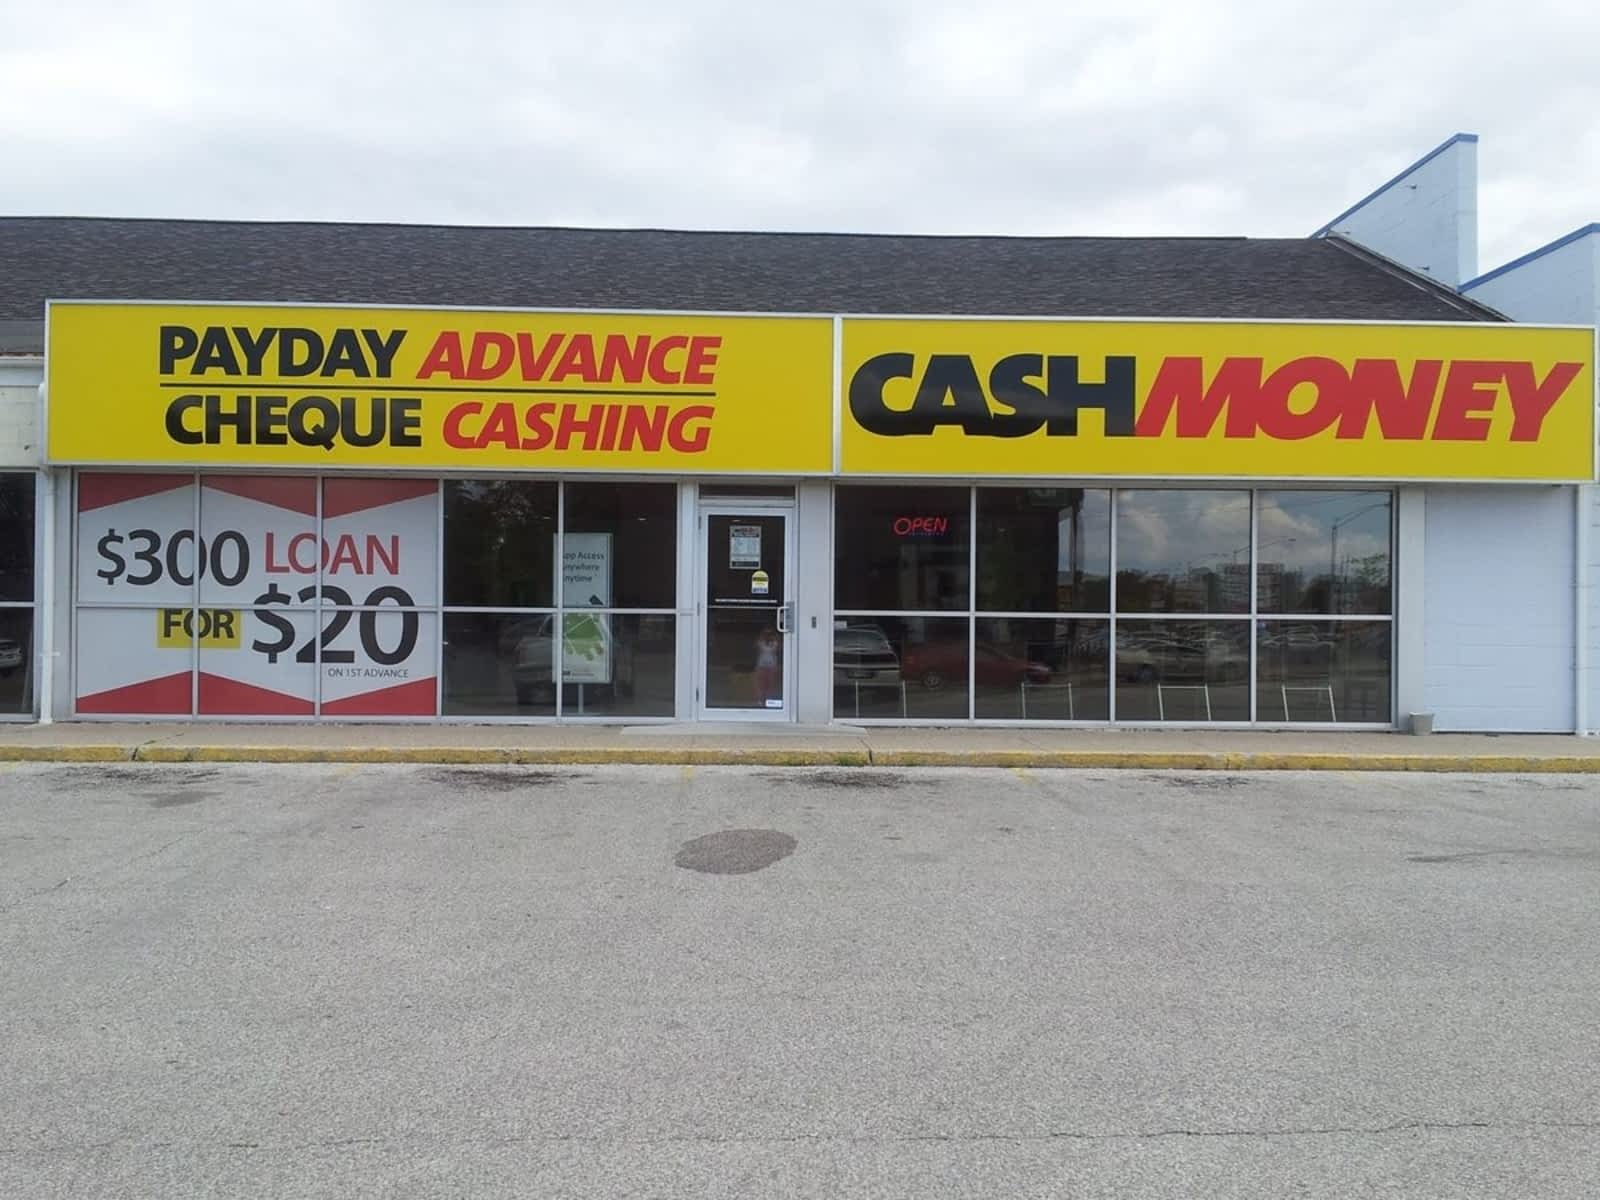 Payday loan davenport image 7